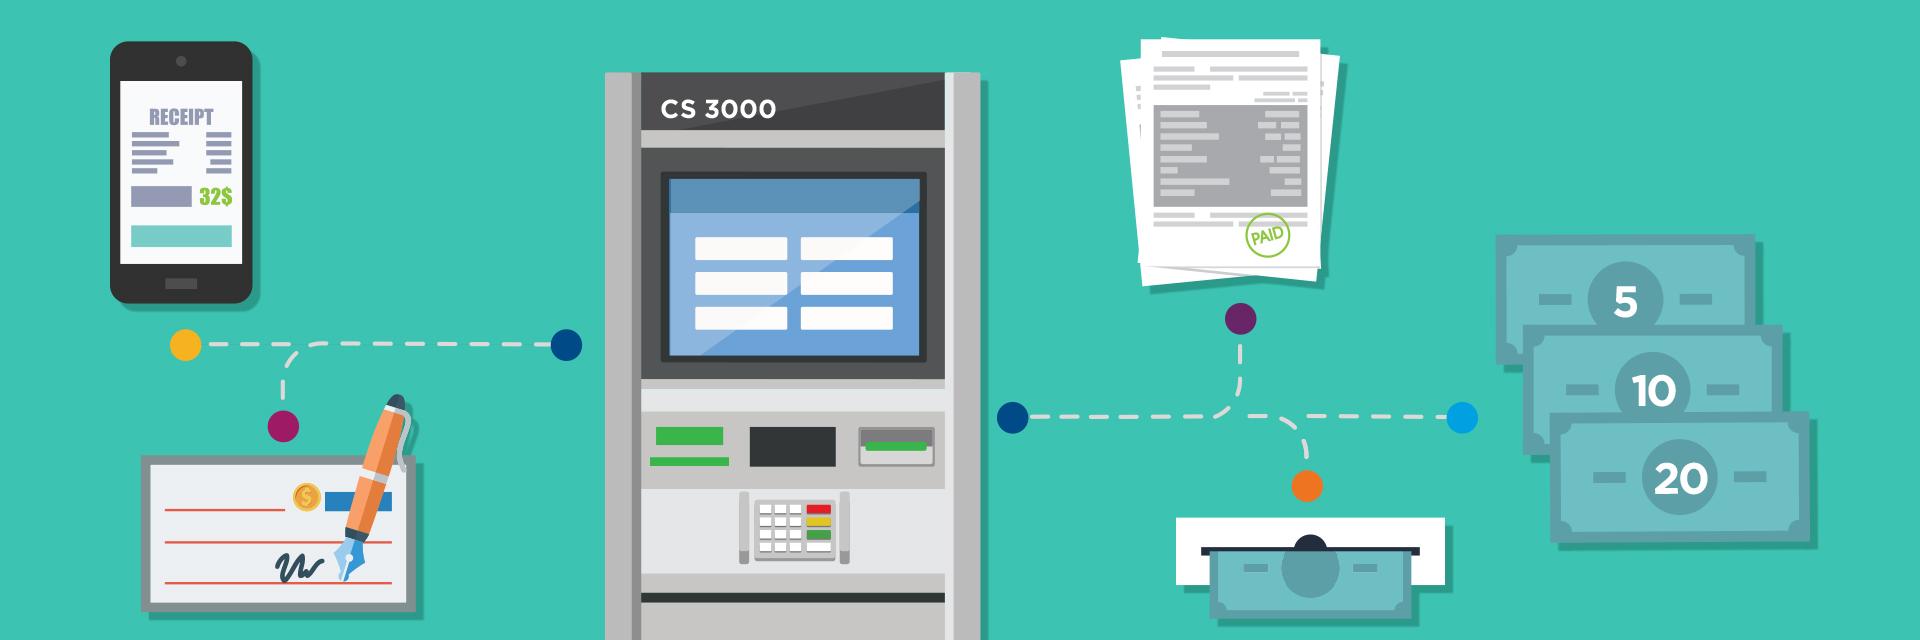 DN_20160906_Blog_Power-ATM